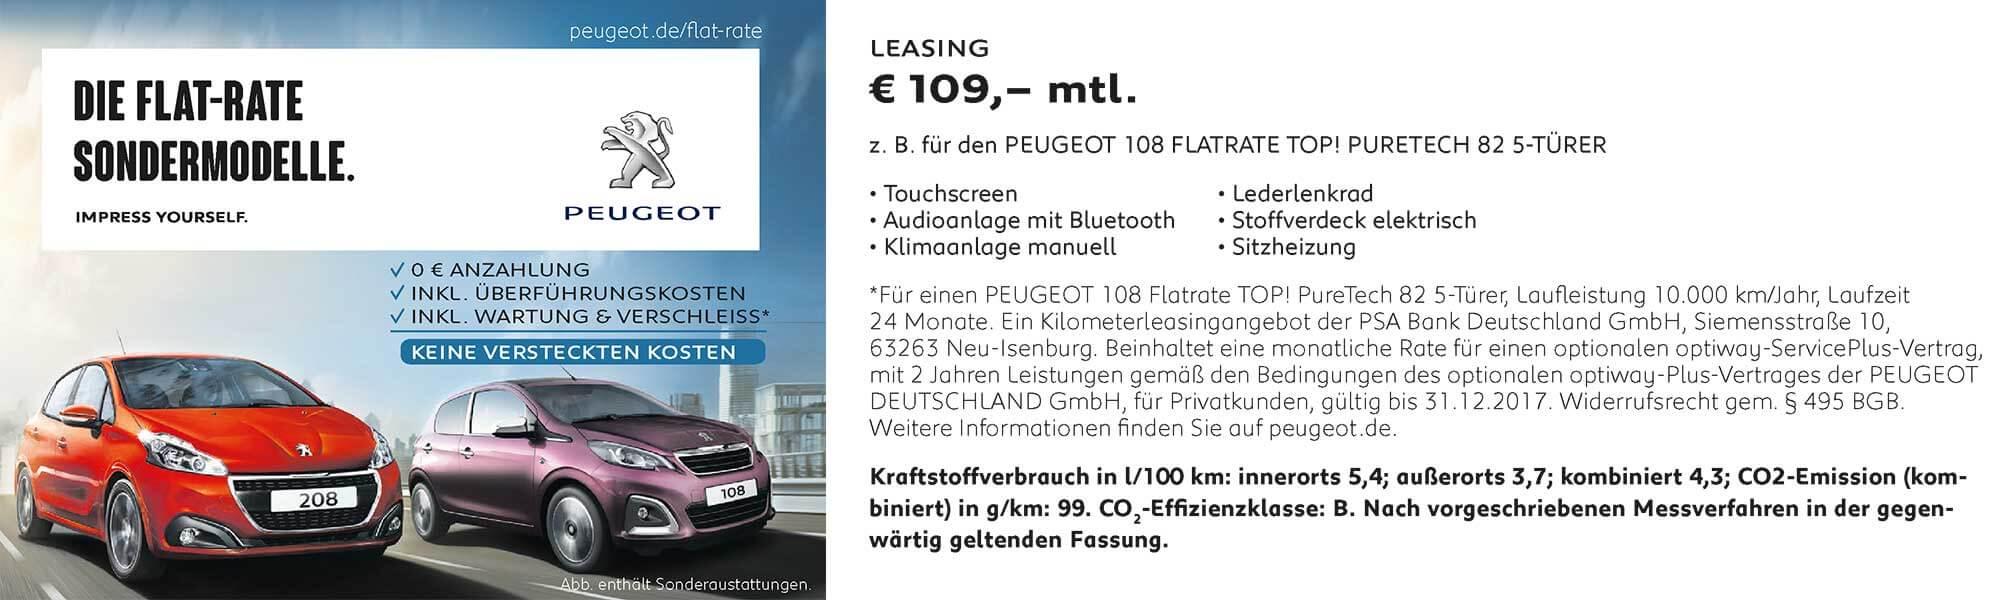 Leasing Angebot Peugeot